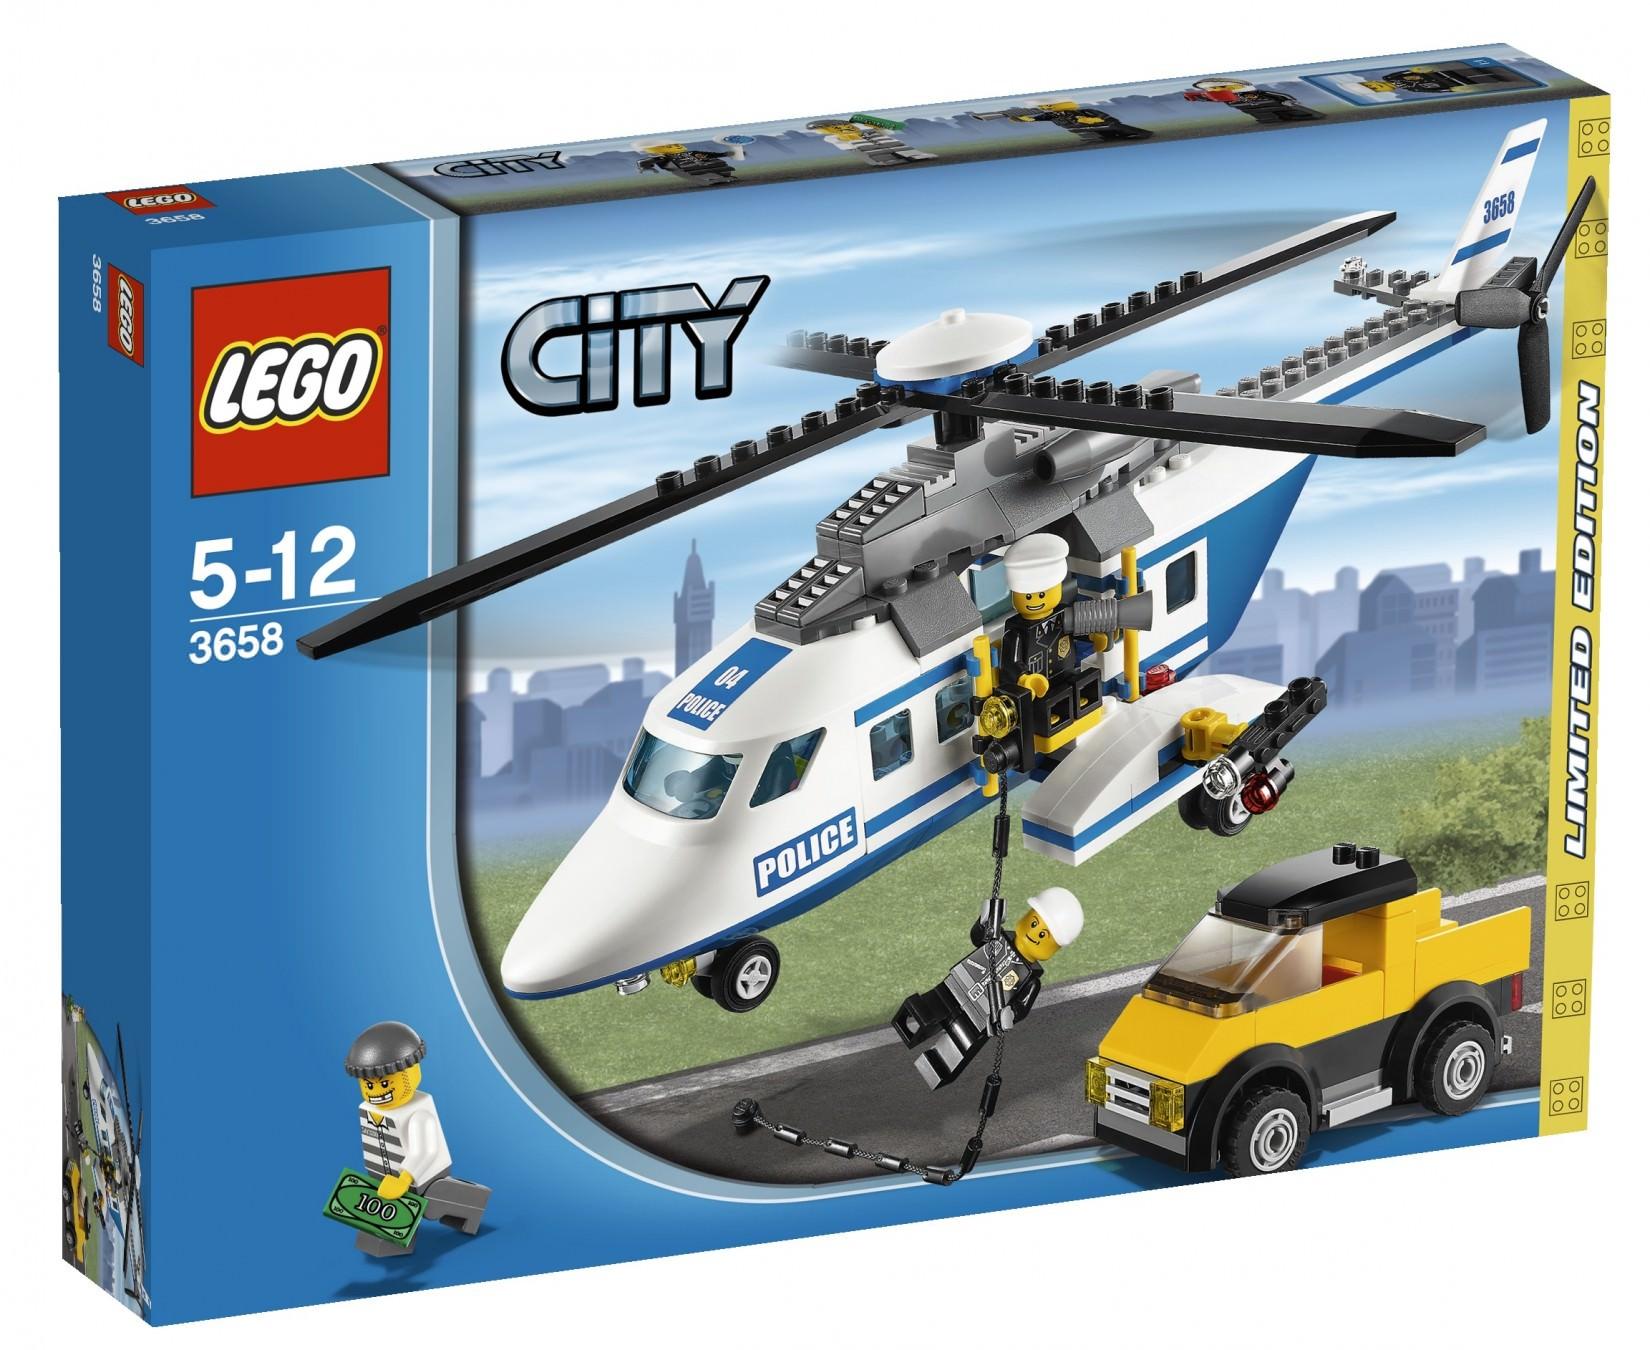 Elicottero Lego City Polizia : Kupovina preko interneta kupindo